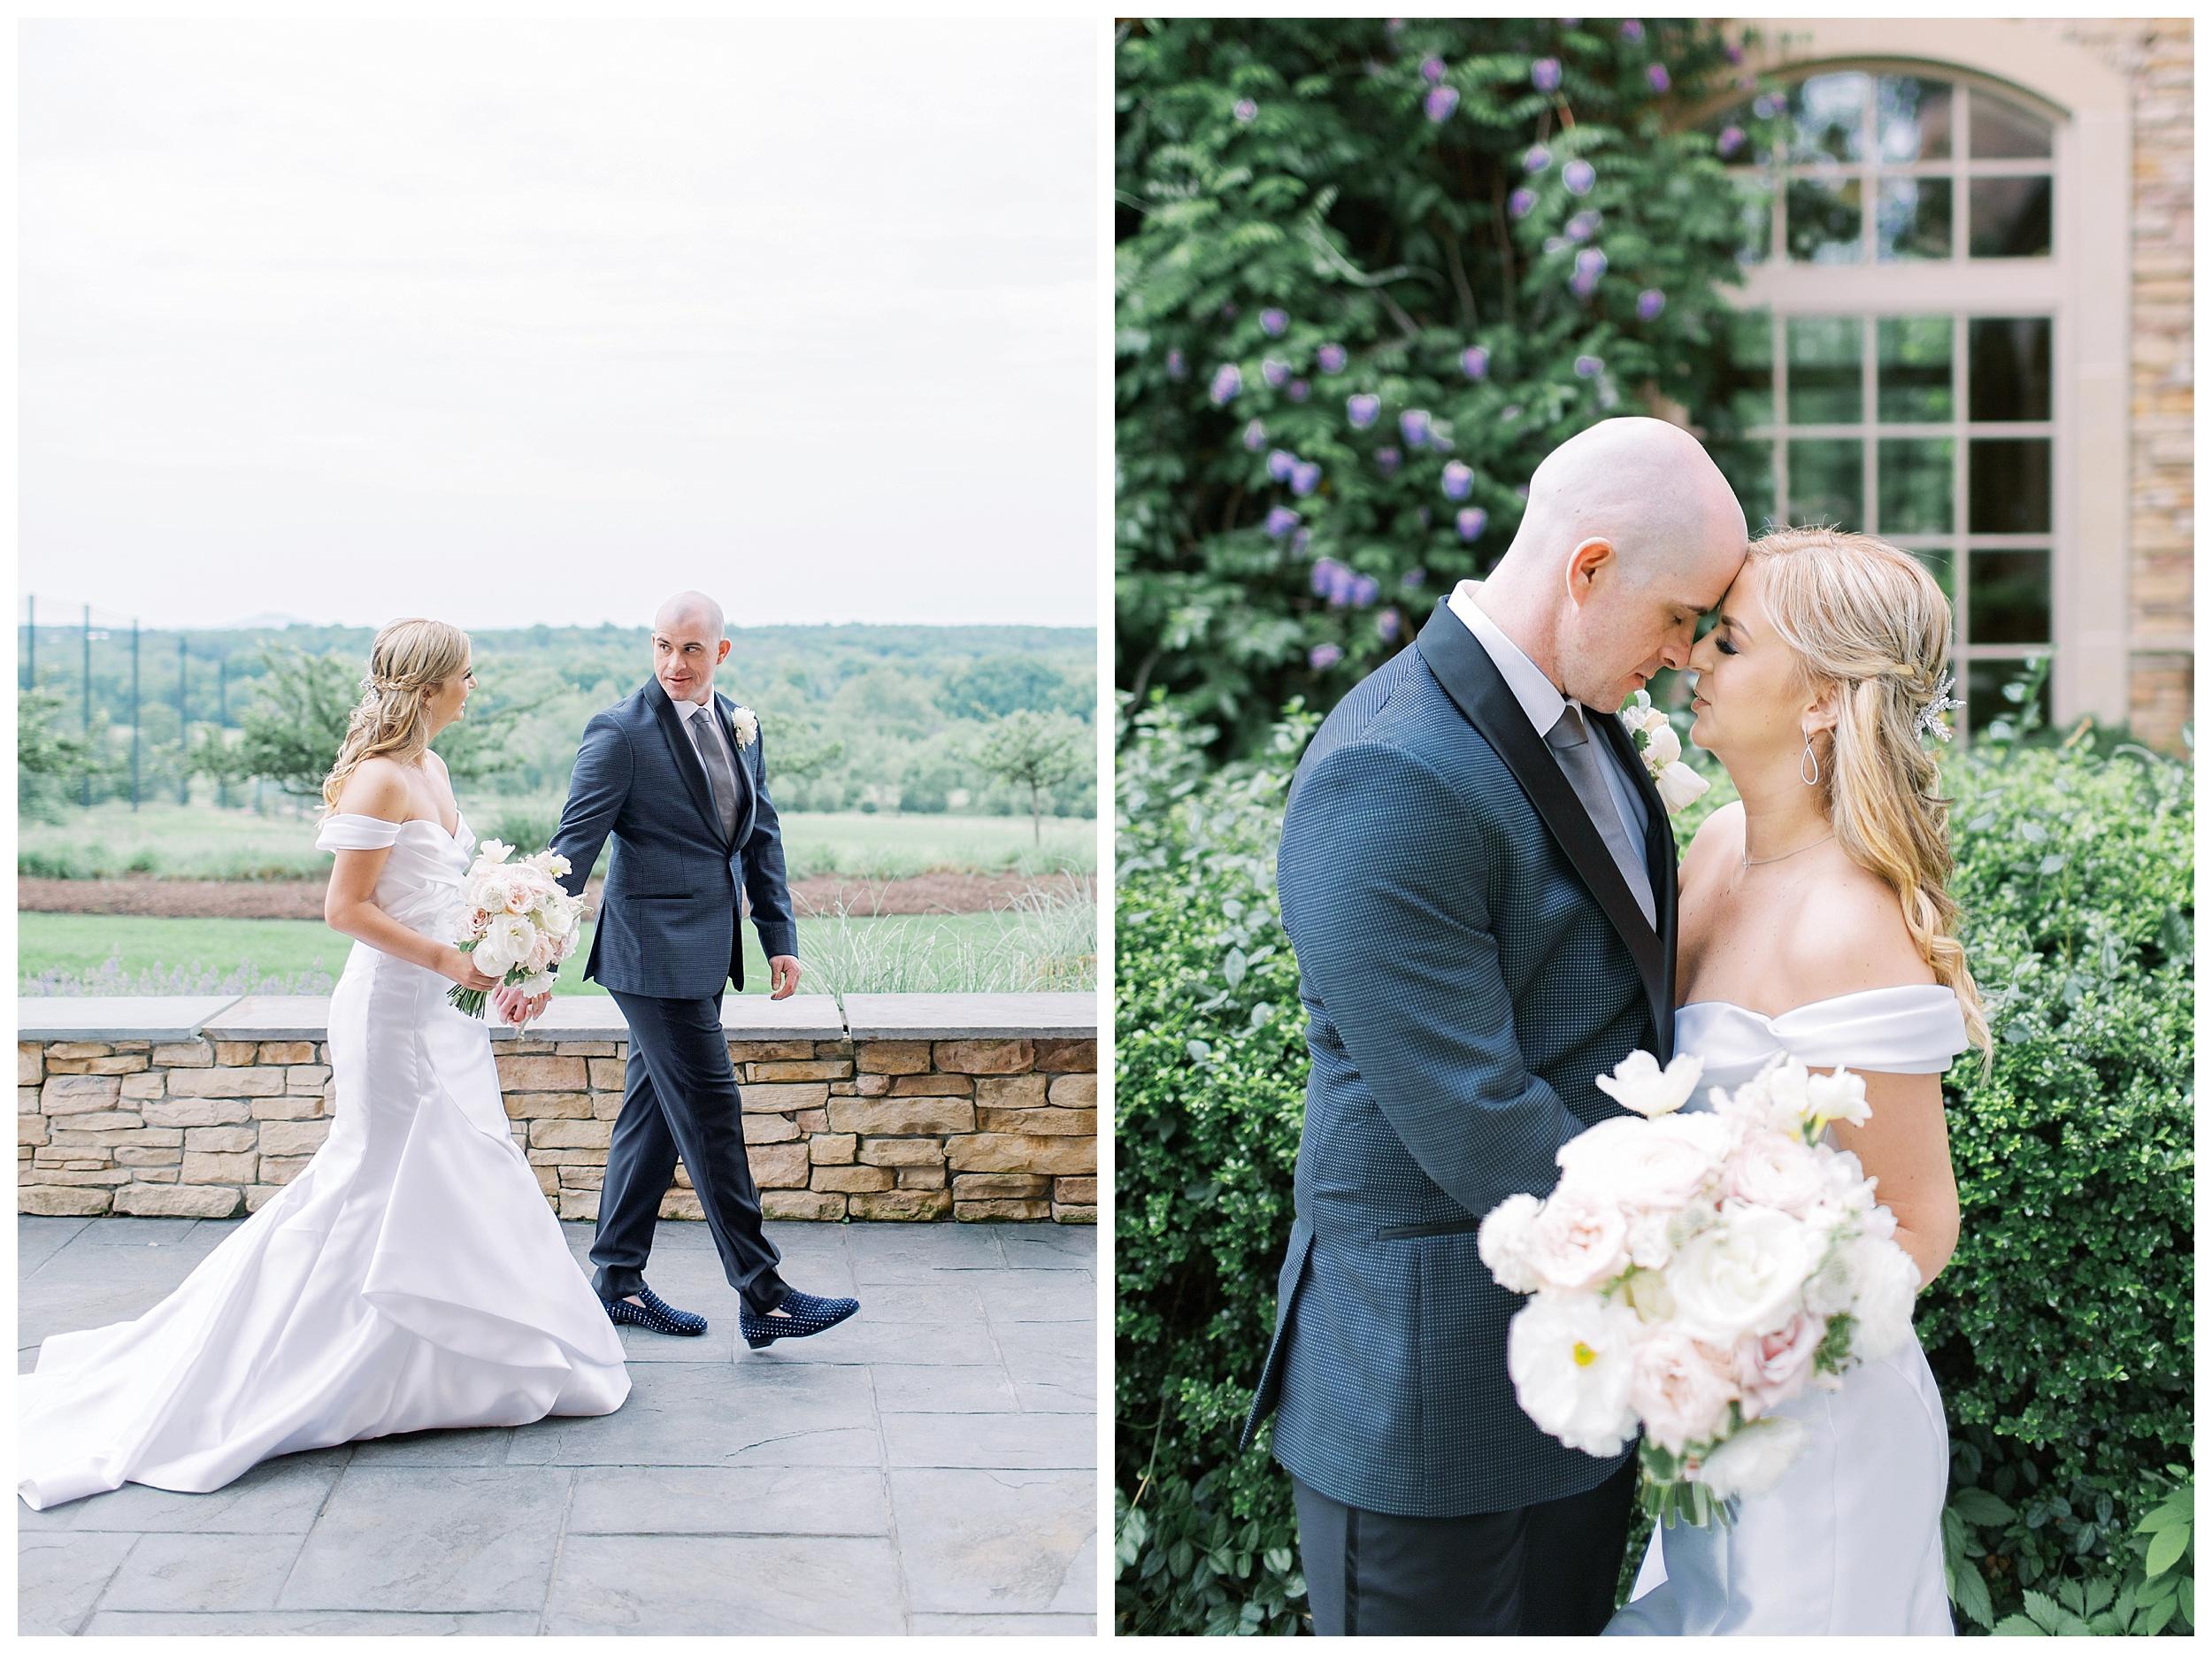 Lansdowne Resort Wedding | Virginia Film Wedding Photographer Kir Tuben_0044.jpg